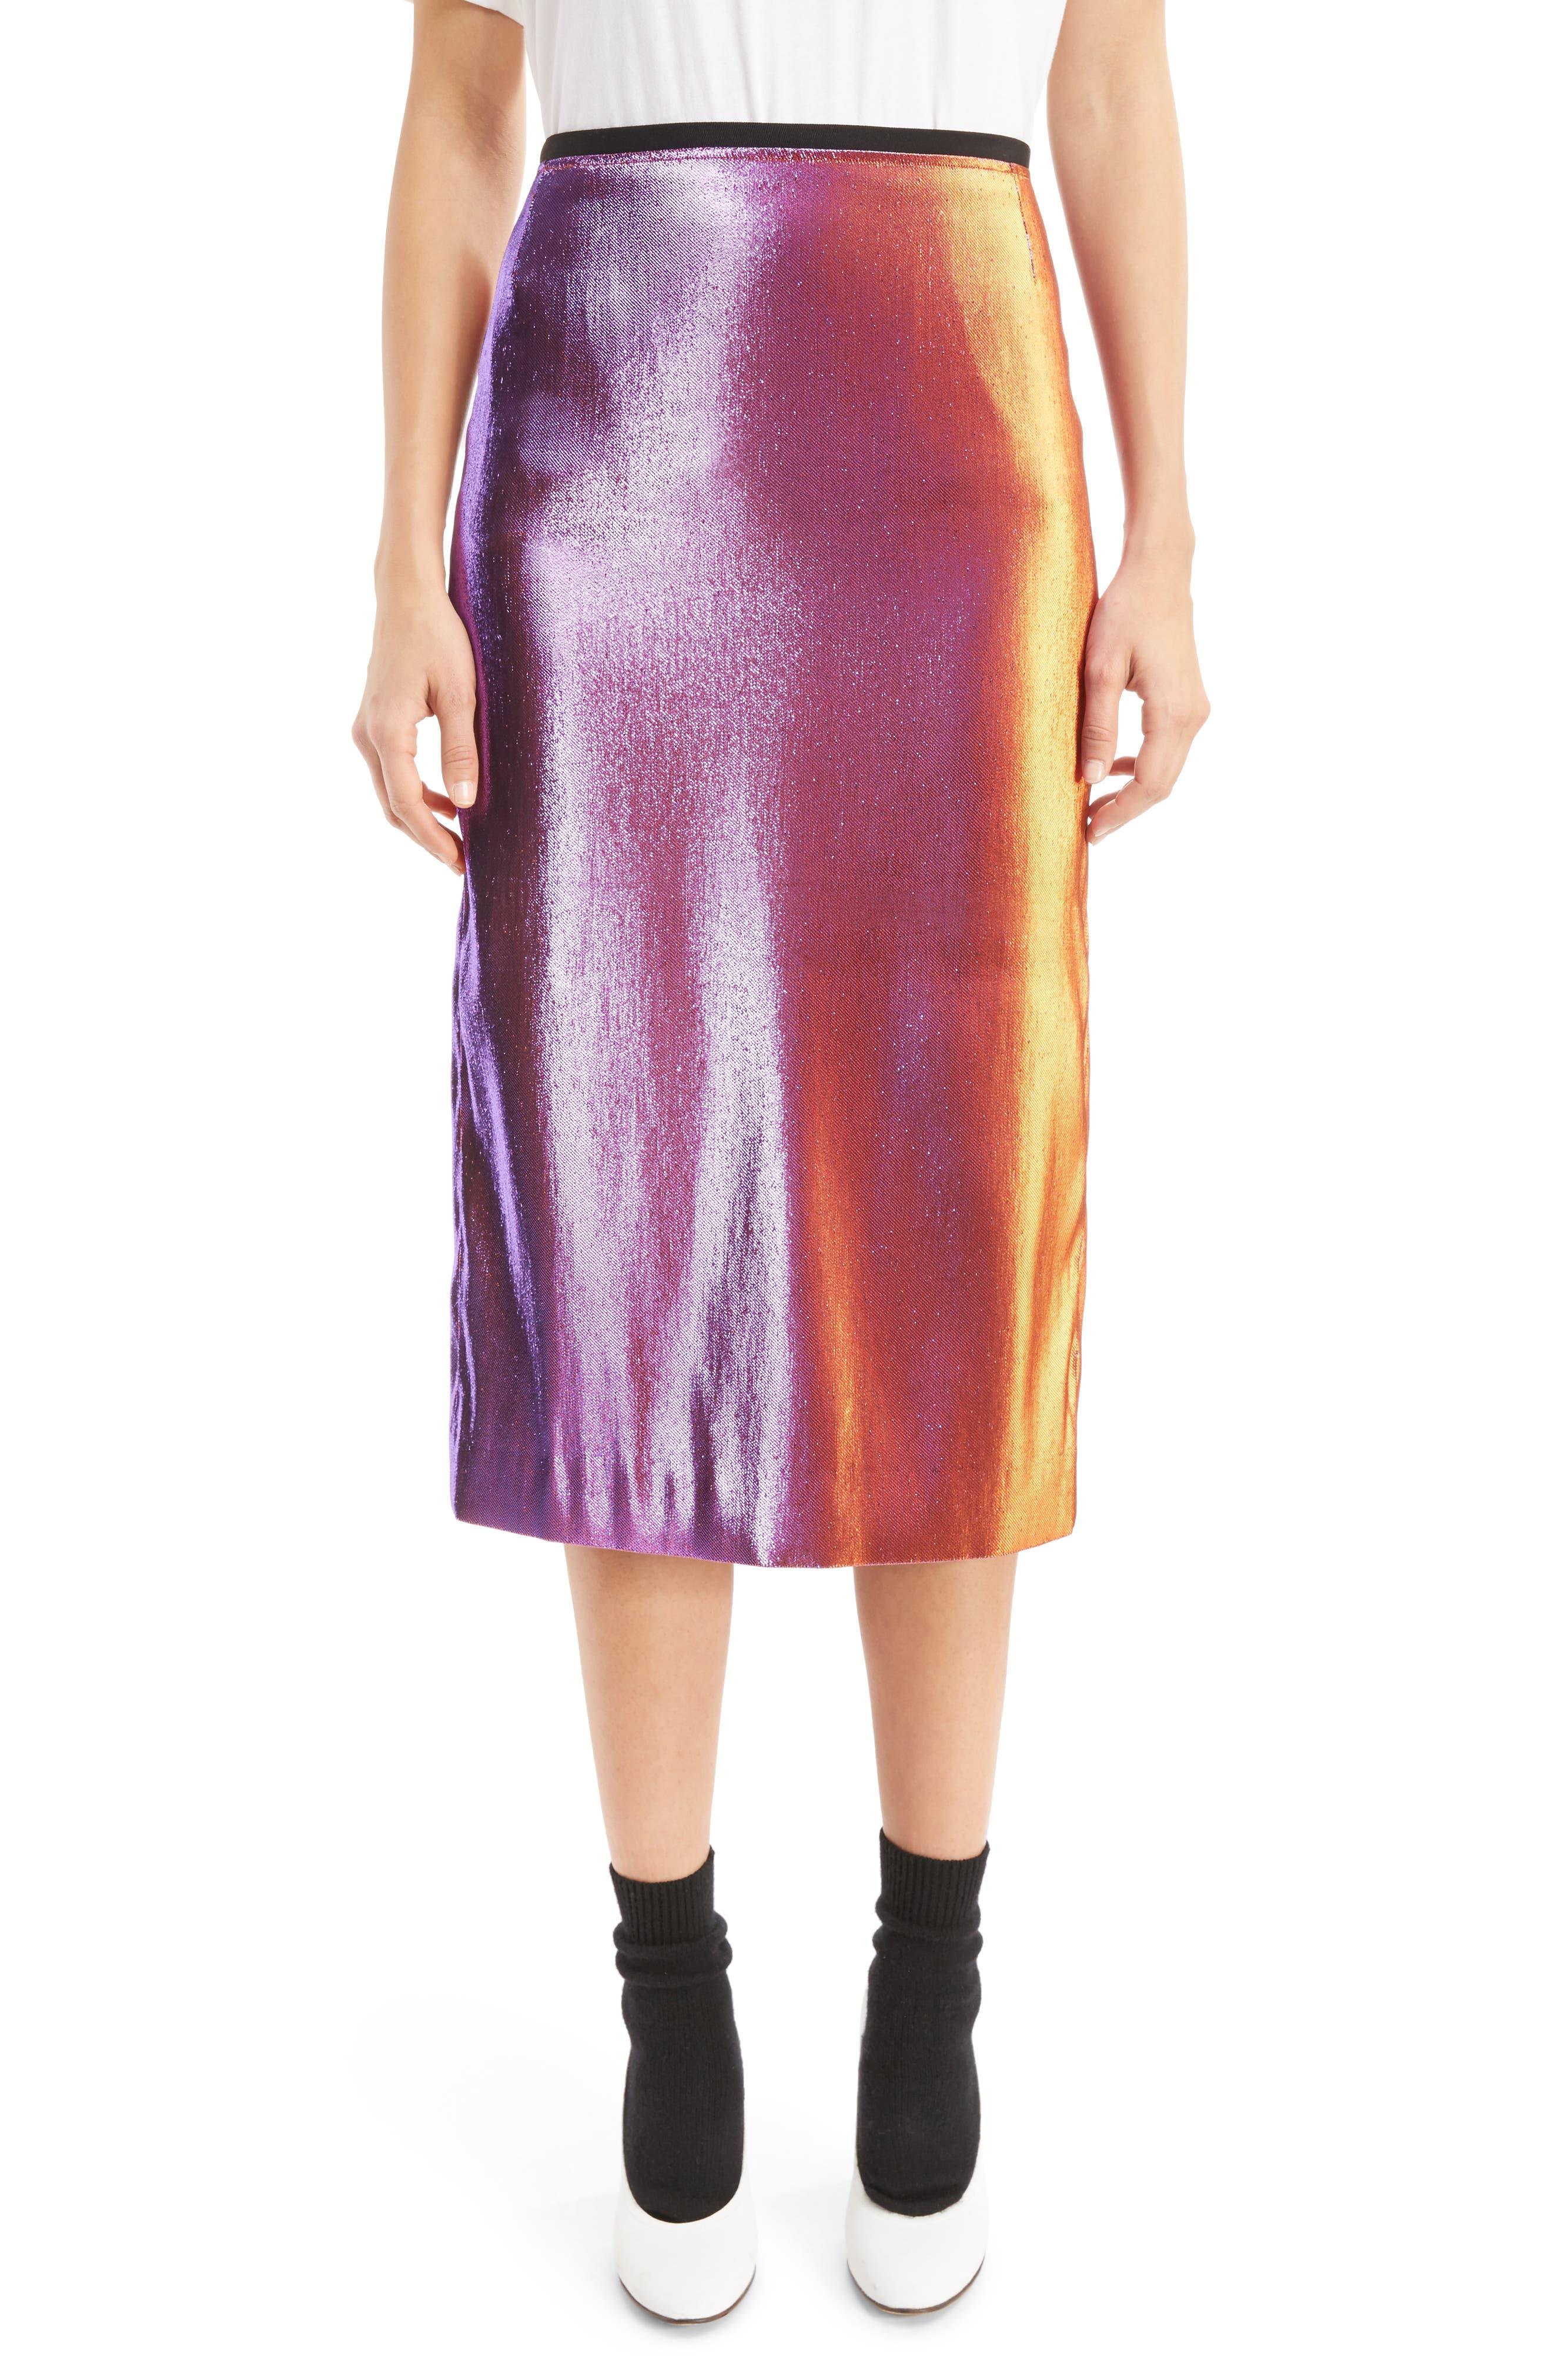 Alternate Image 1 Selected - Dries Van Noten Two-Tone Lamé Pencil Skirt